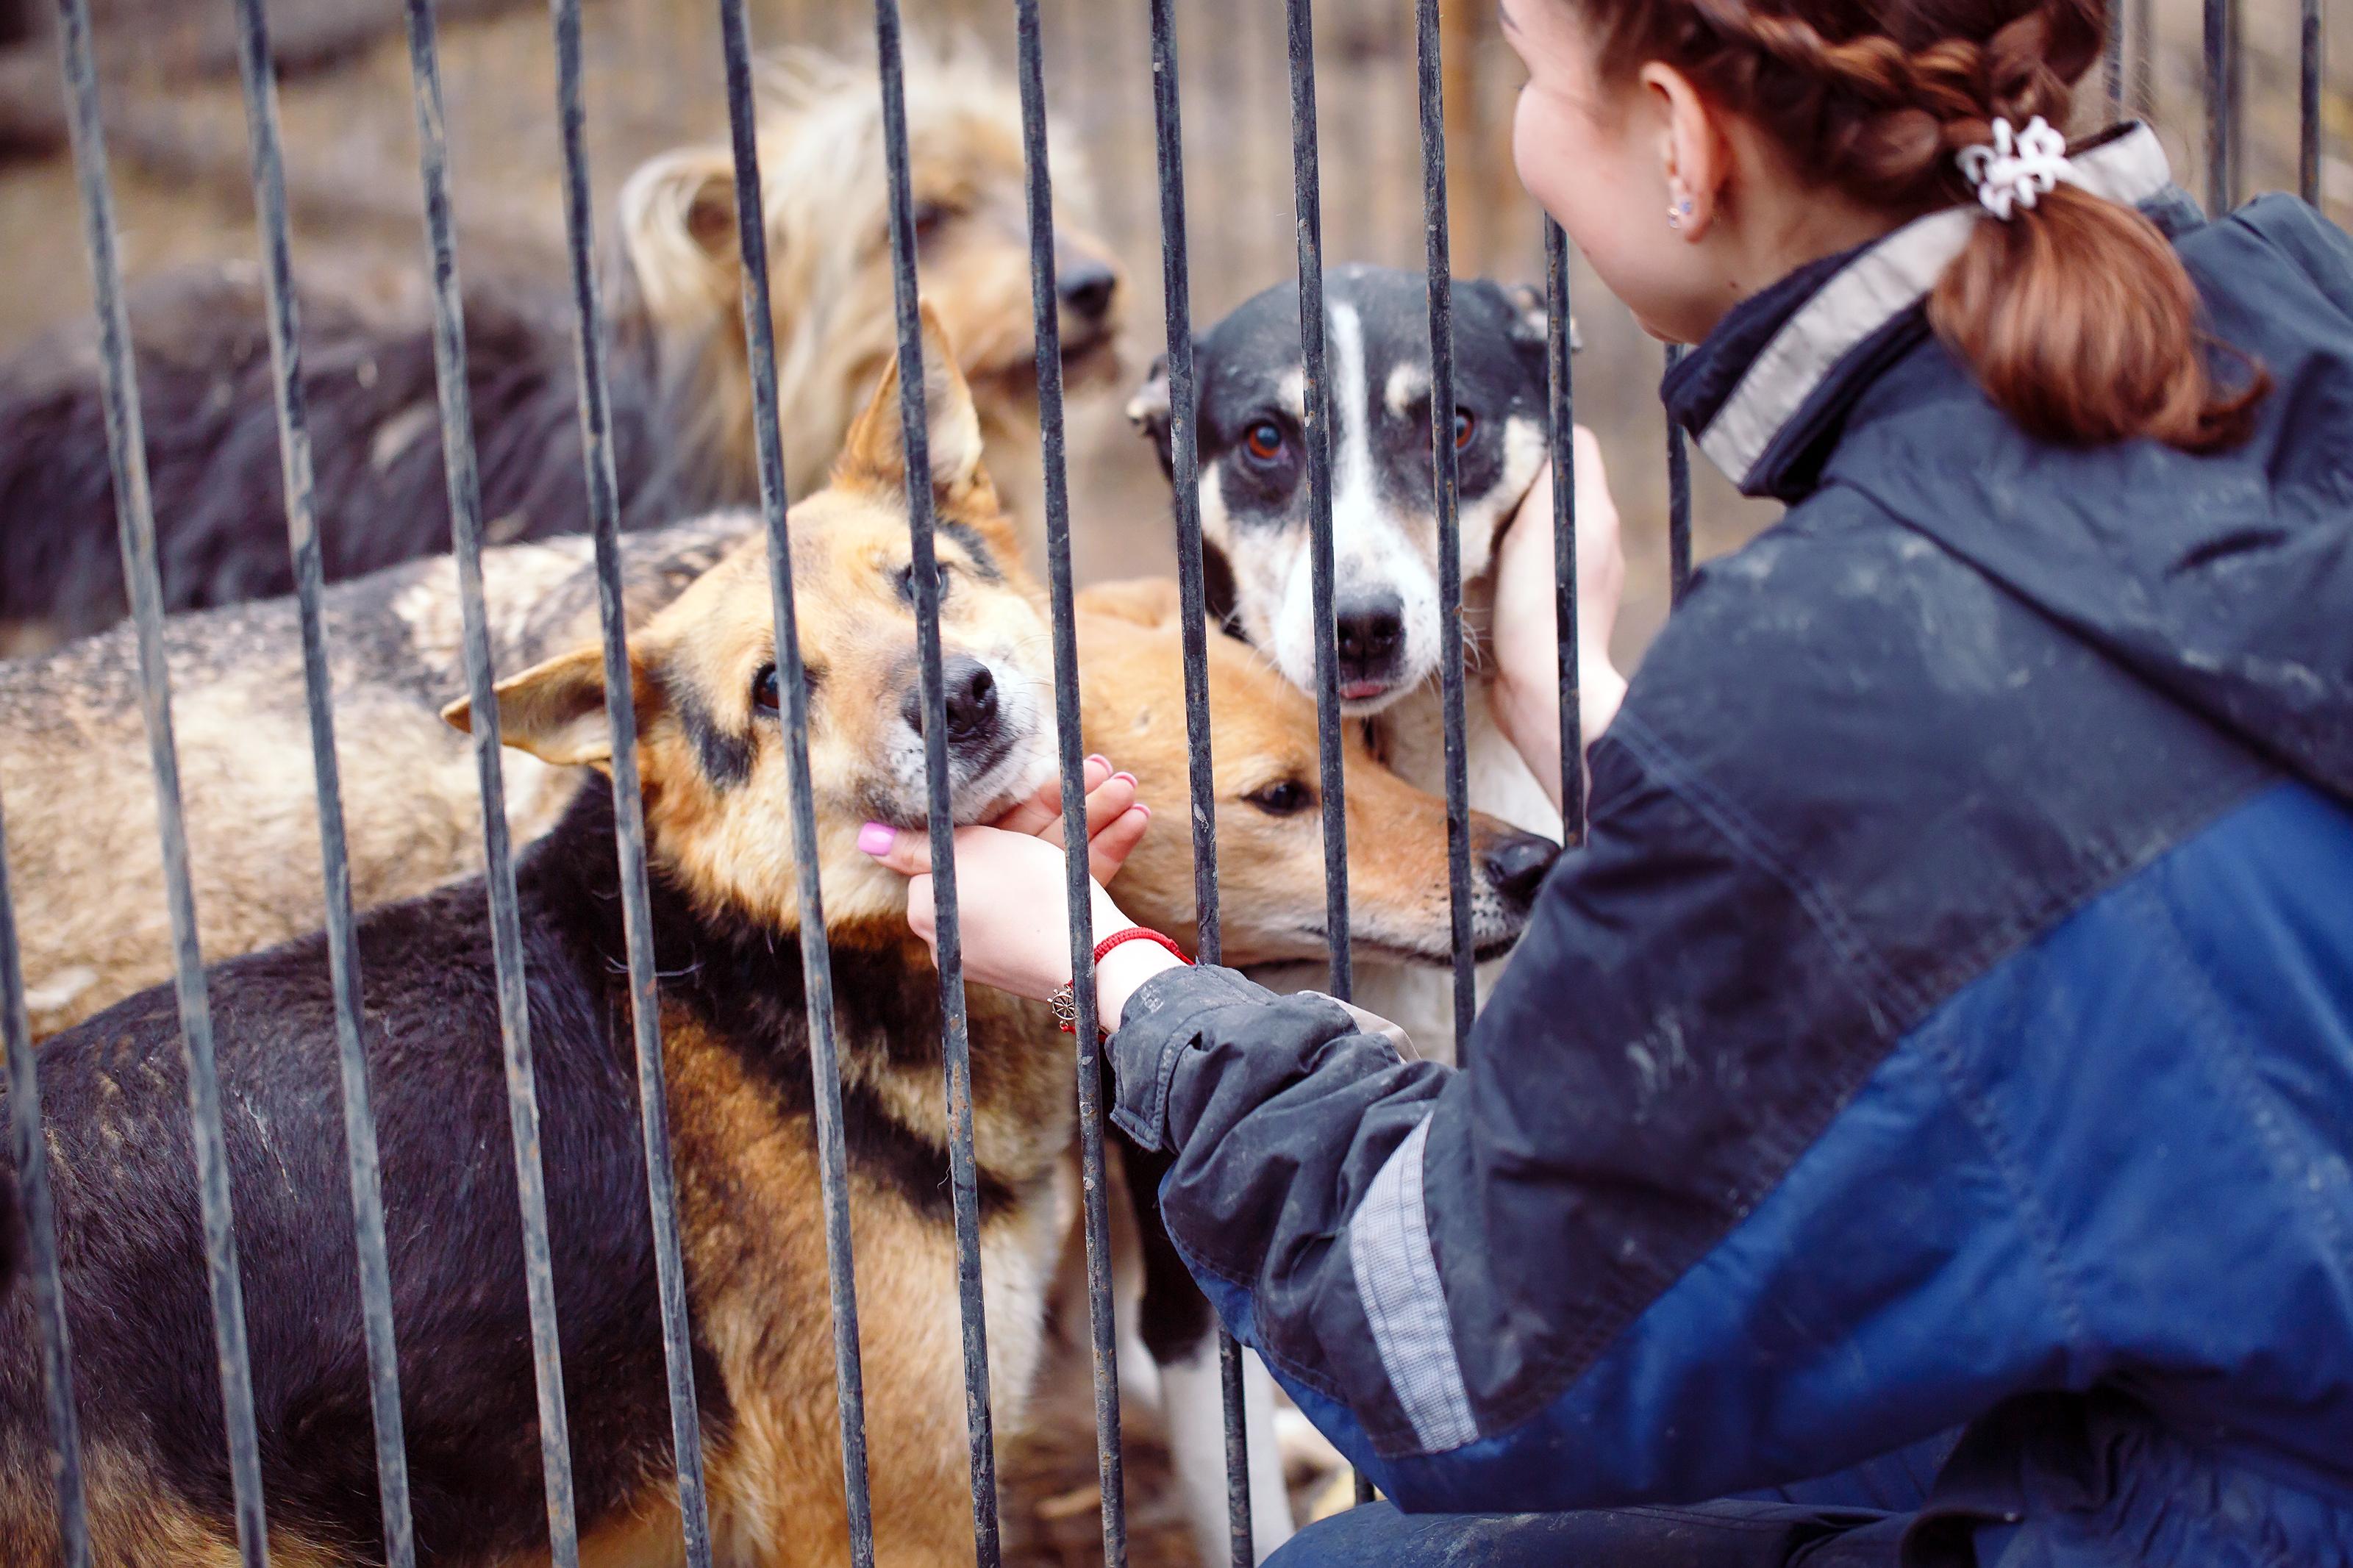 Girl in waterproof jacket petting four dogs behind bars